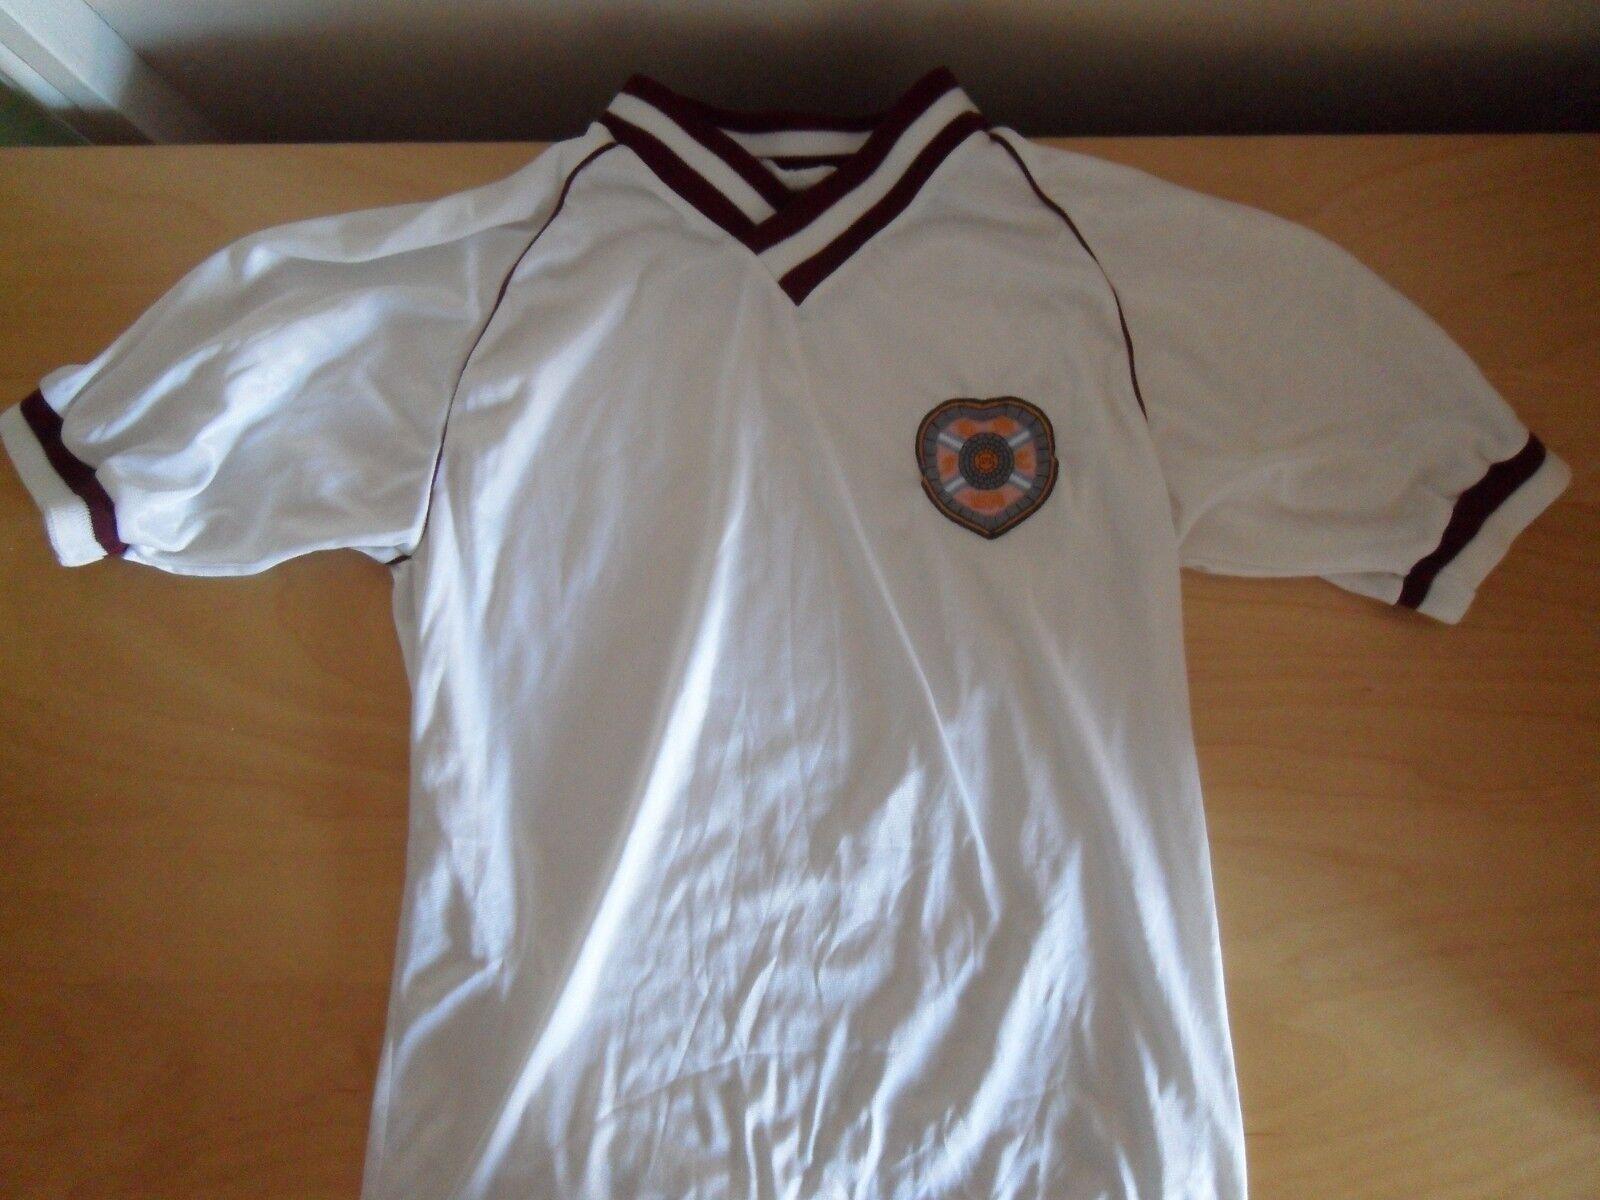 CUORI RETRÒ FOOTBALL SHIRT ANNI'80 Bukta Grandi Ragazzi. Cuore Di Midlothian